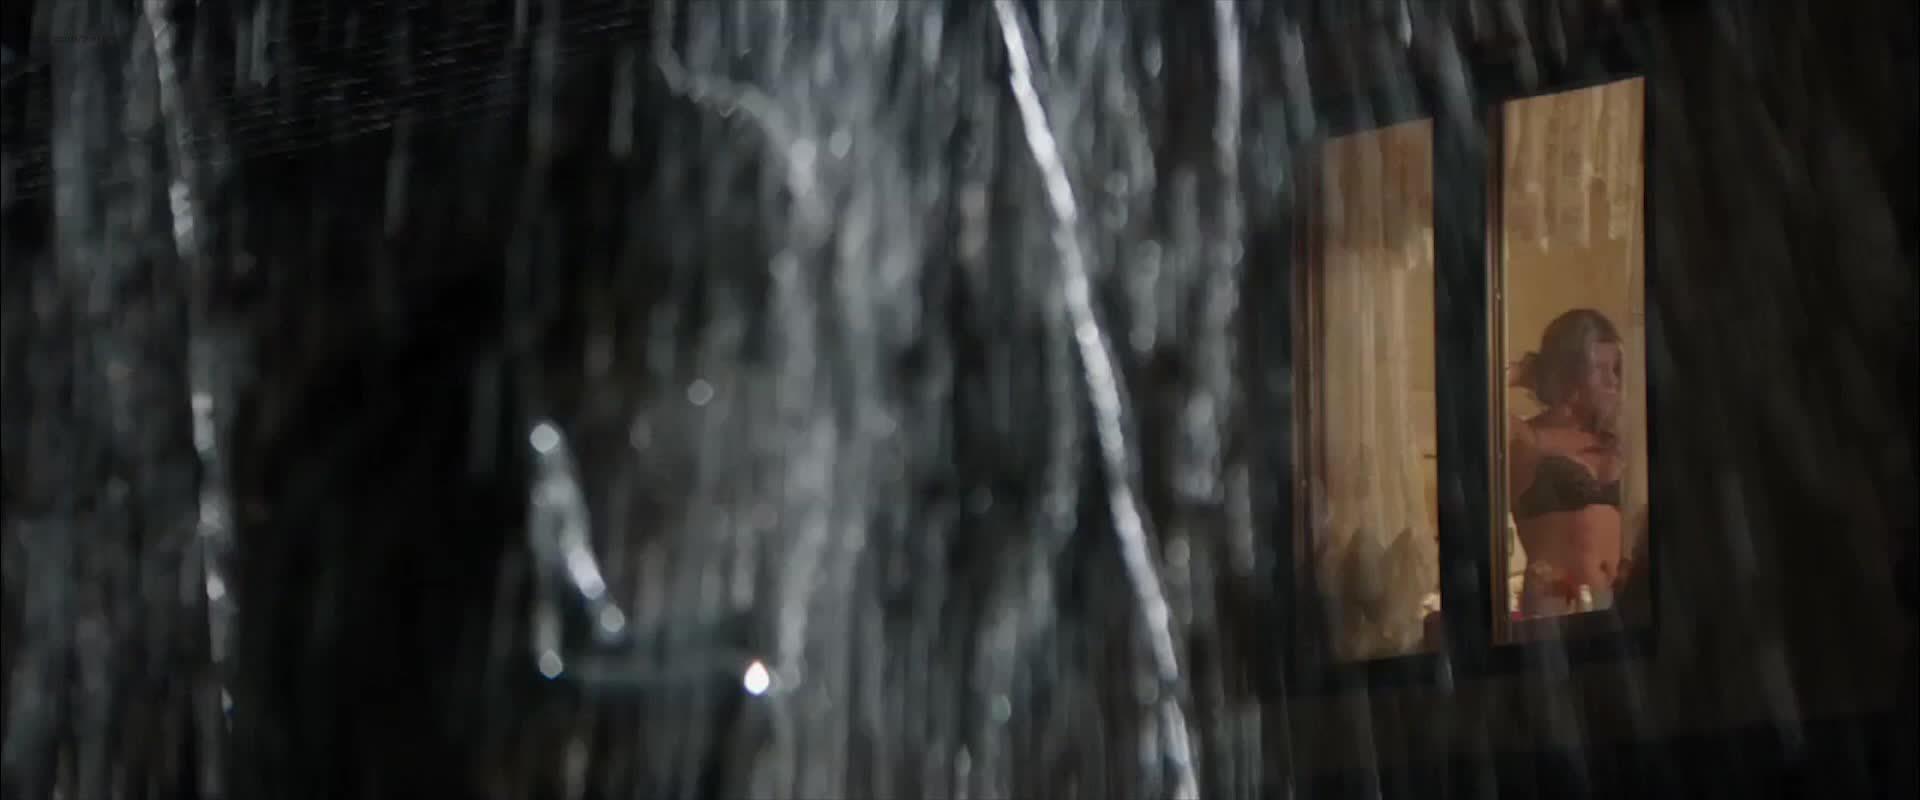 AshleyGreene, ashleygreene, celebs, Ashley Greene GIFs